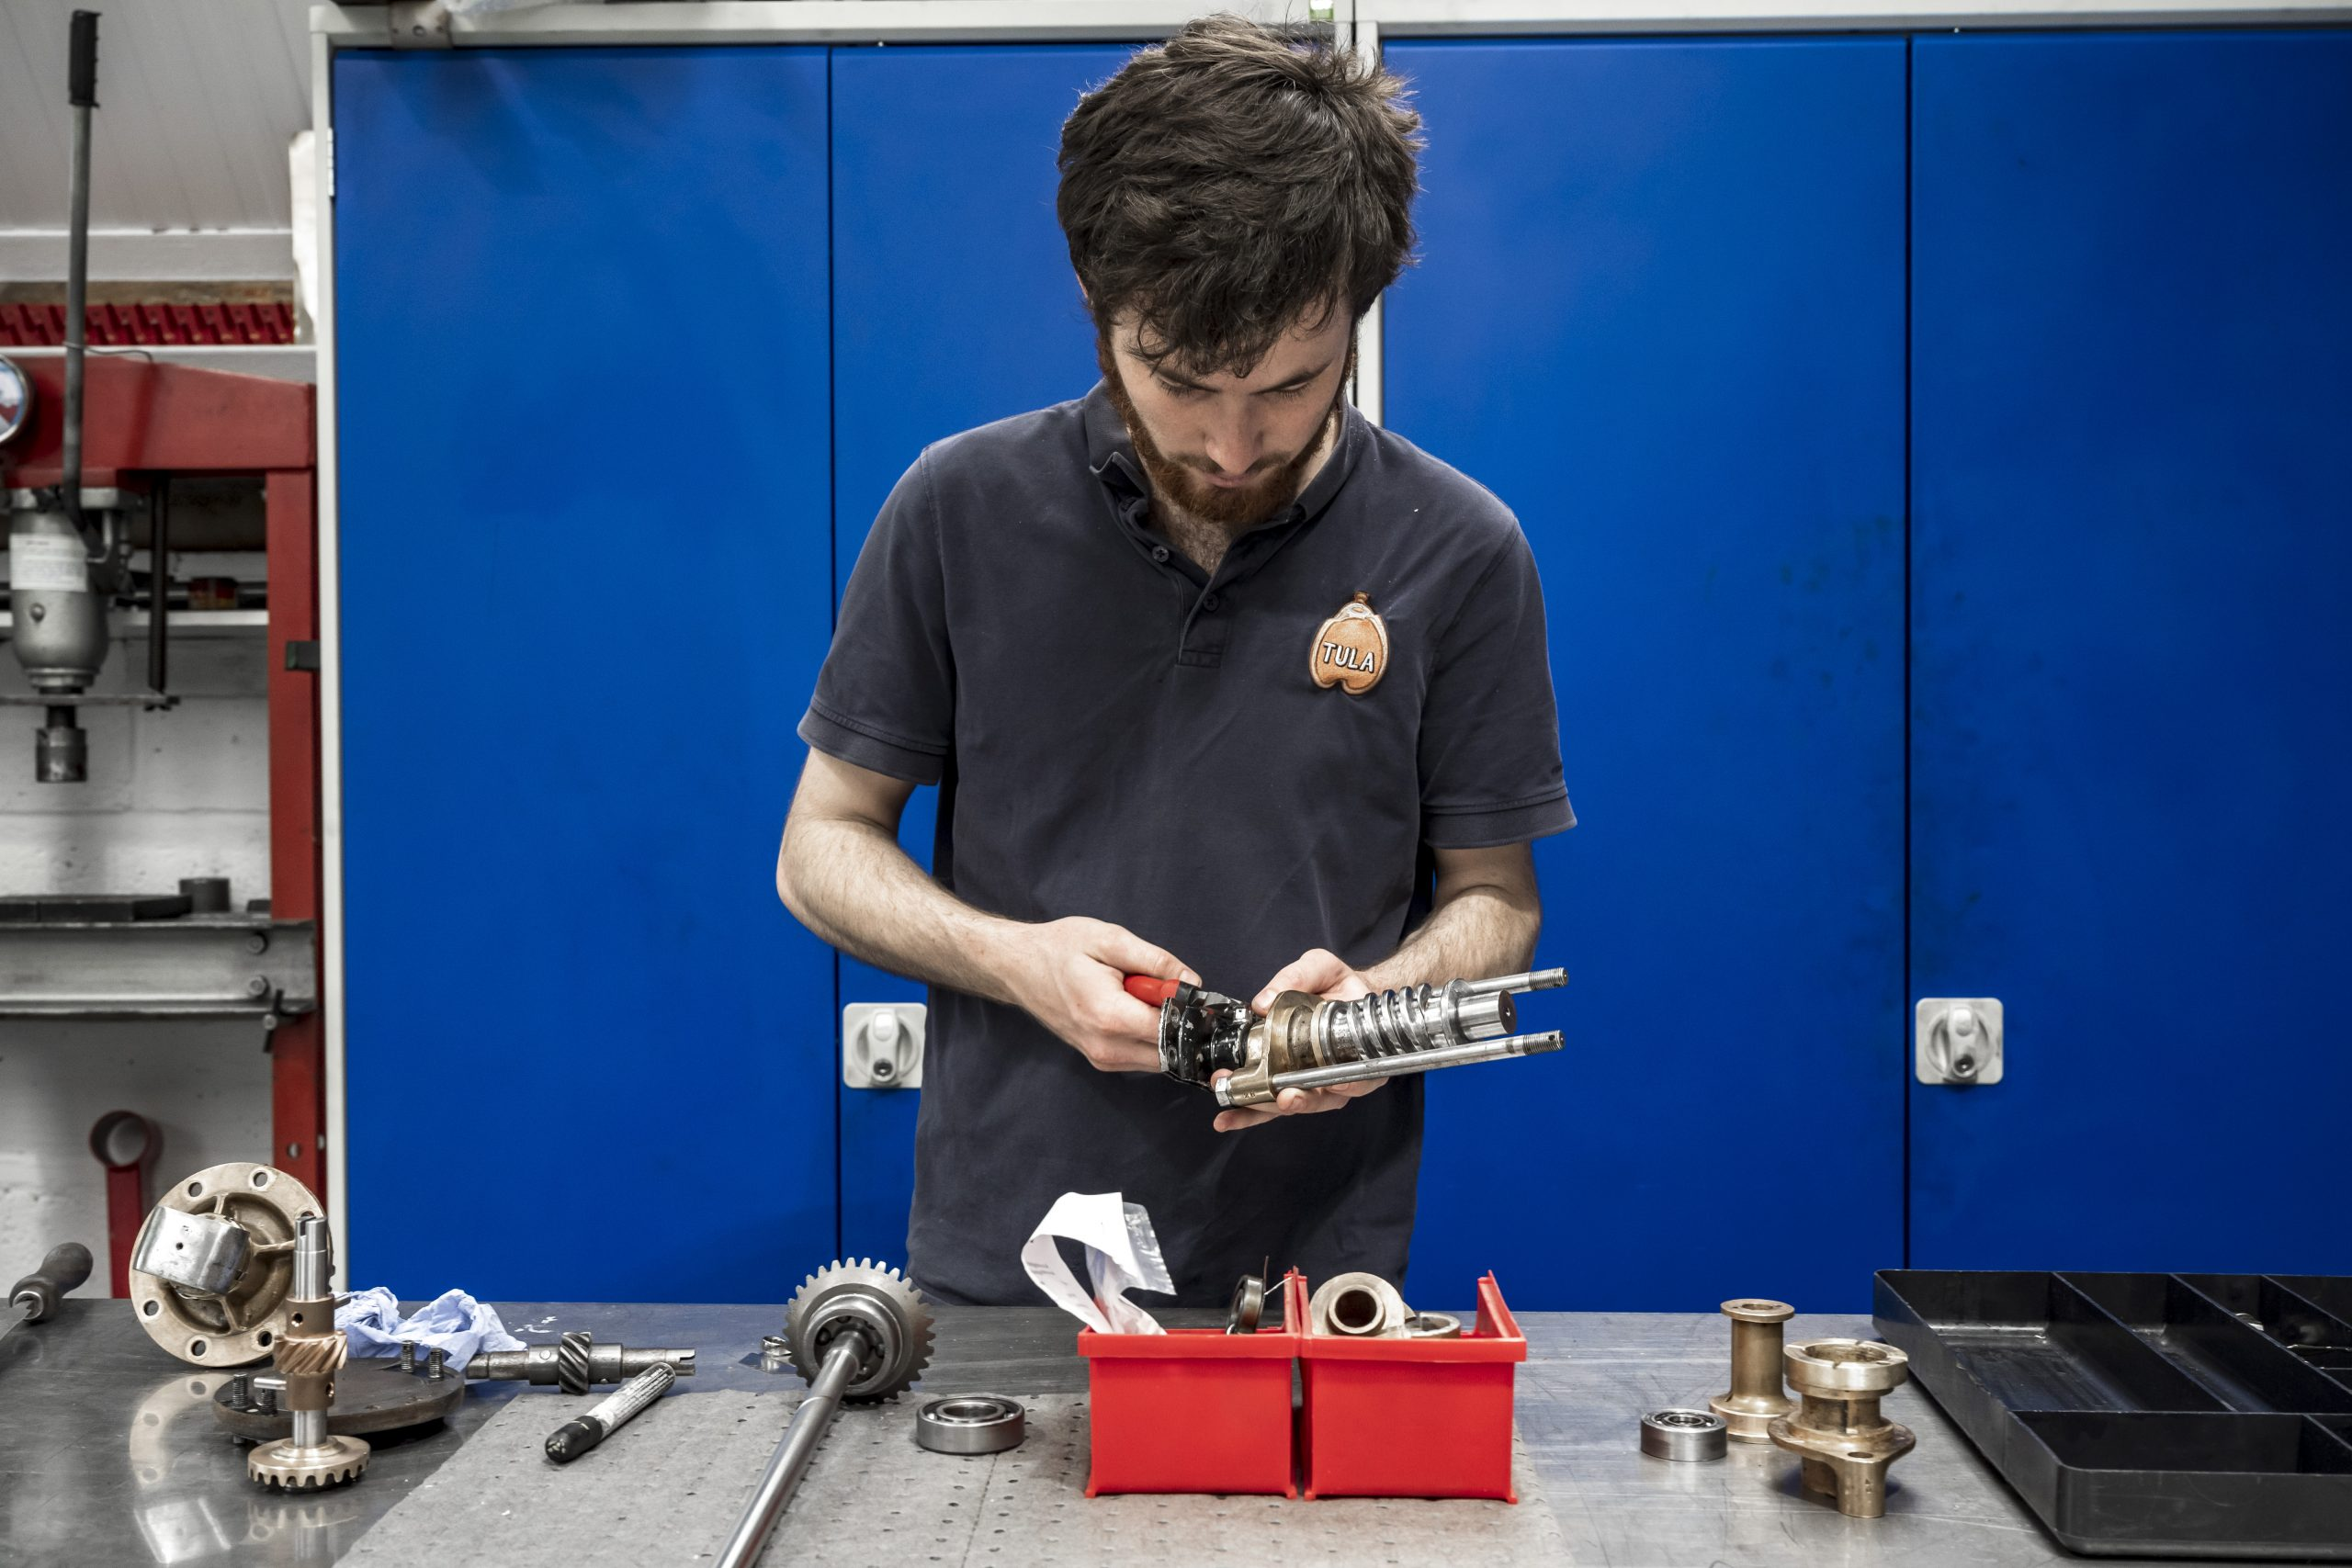 Tula Precision craftsman working hand tools